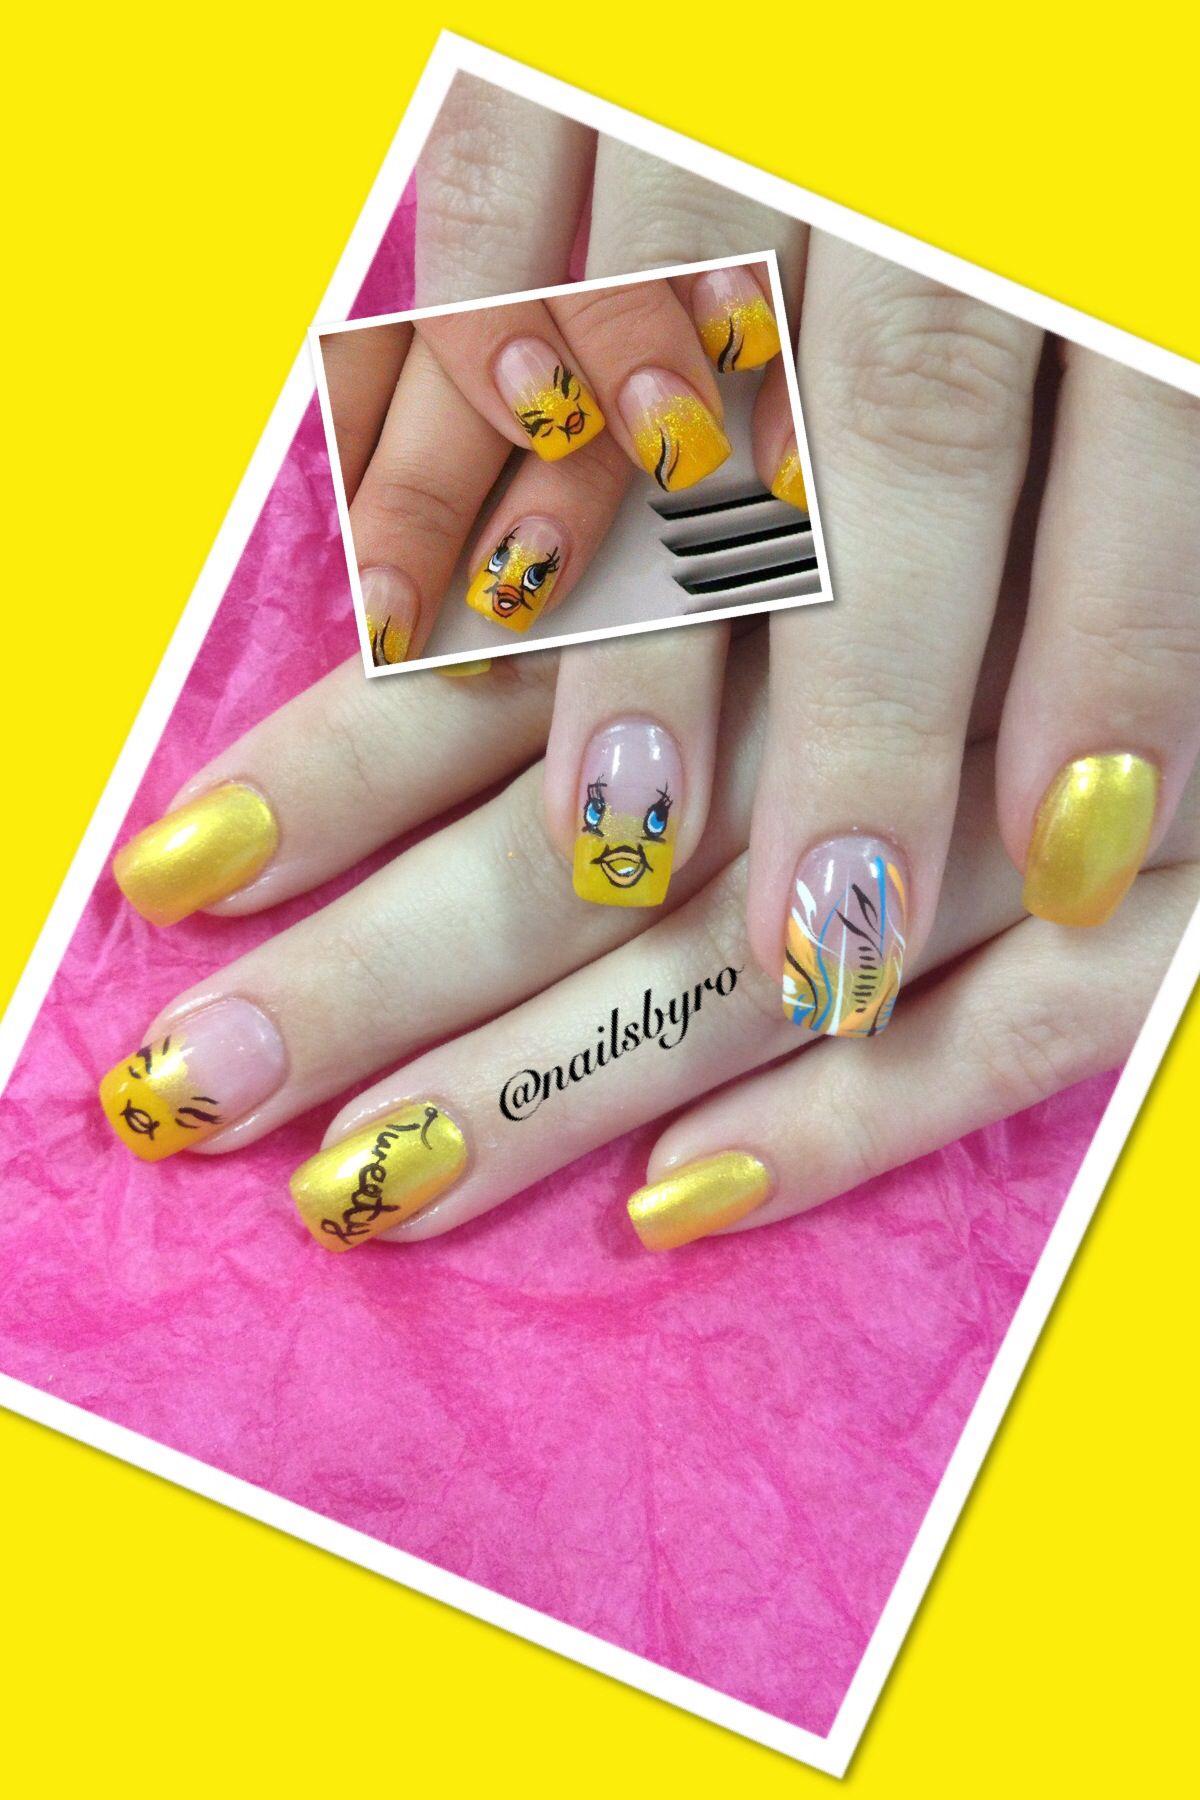 Tweety bird (With images)   Nail art designs, Nail art ...